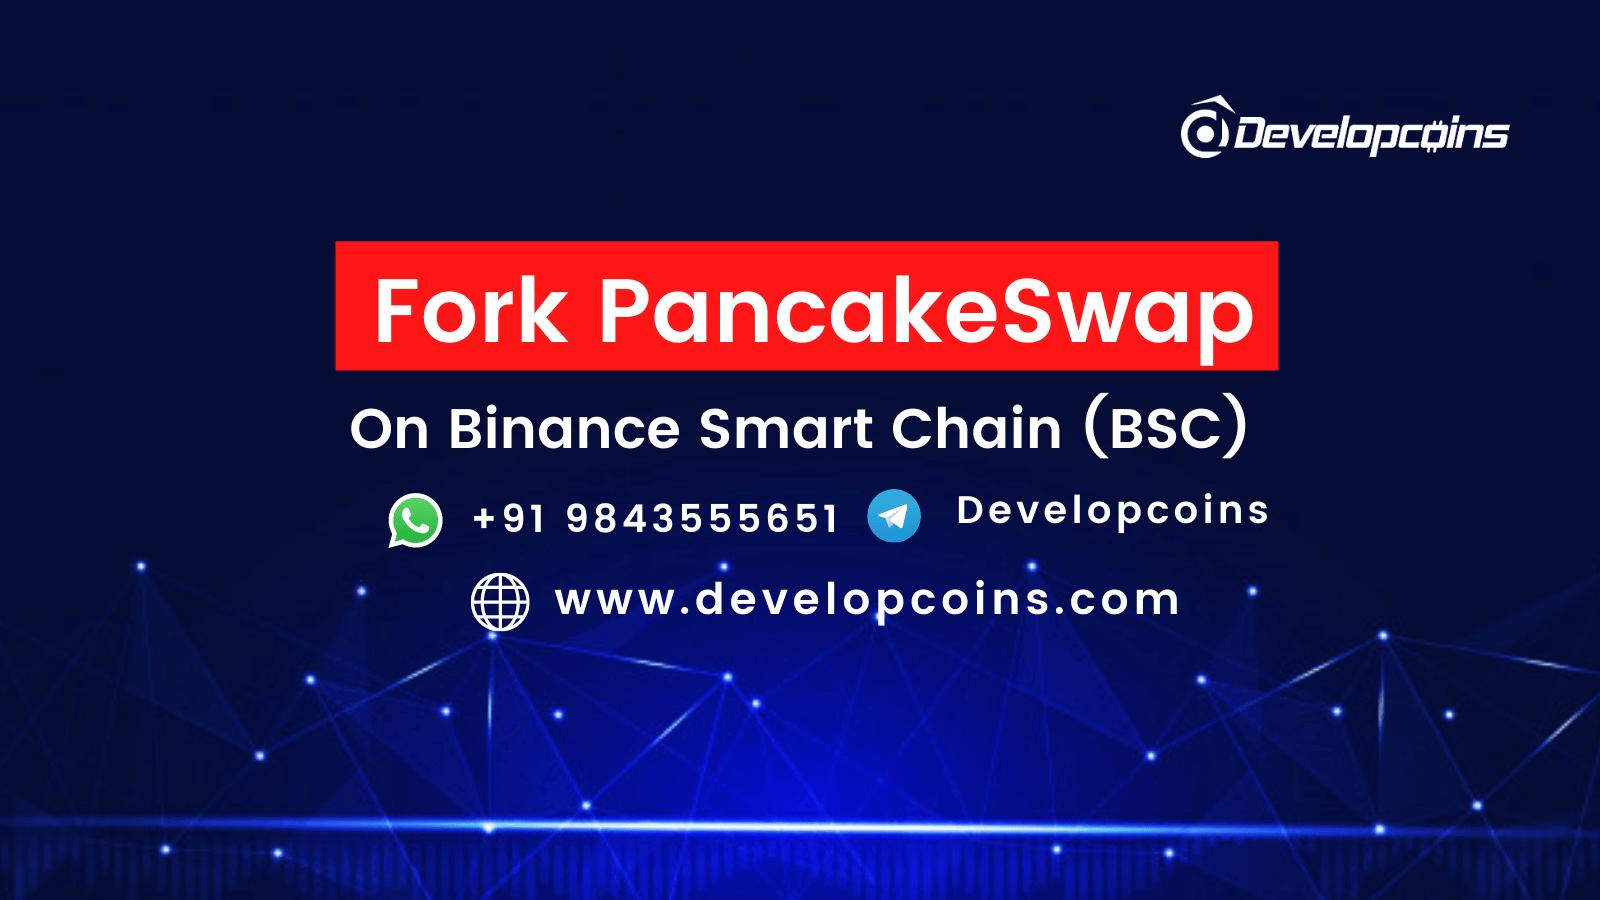 Fork PancakeSwap On Binance Smart Chain